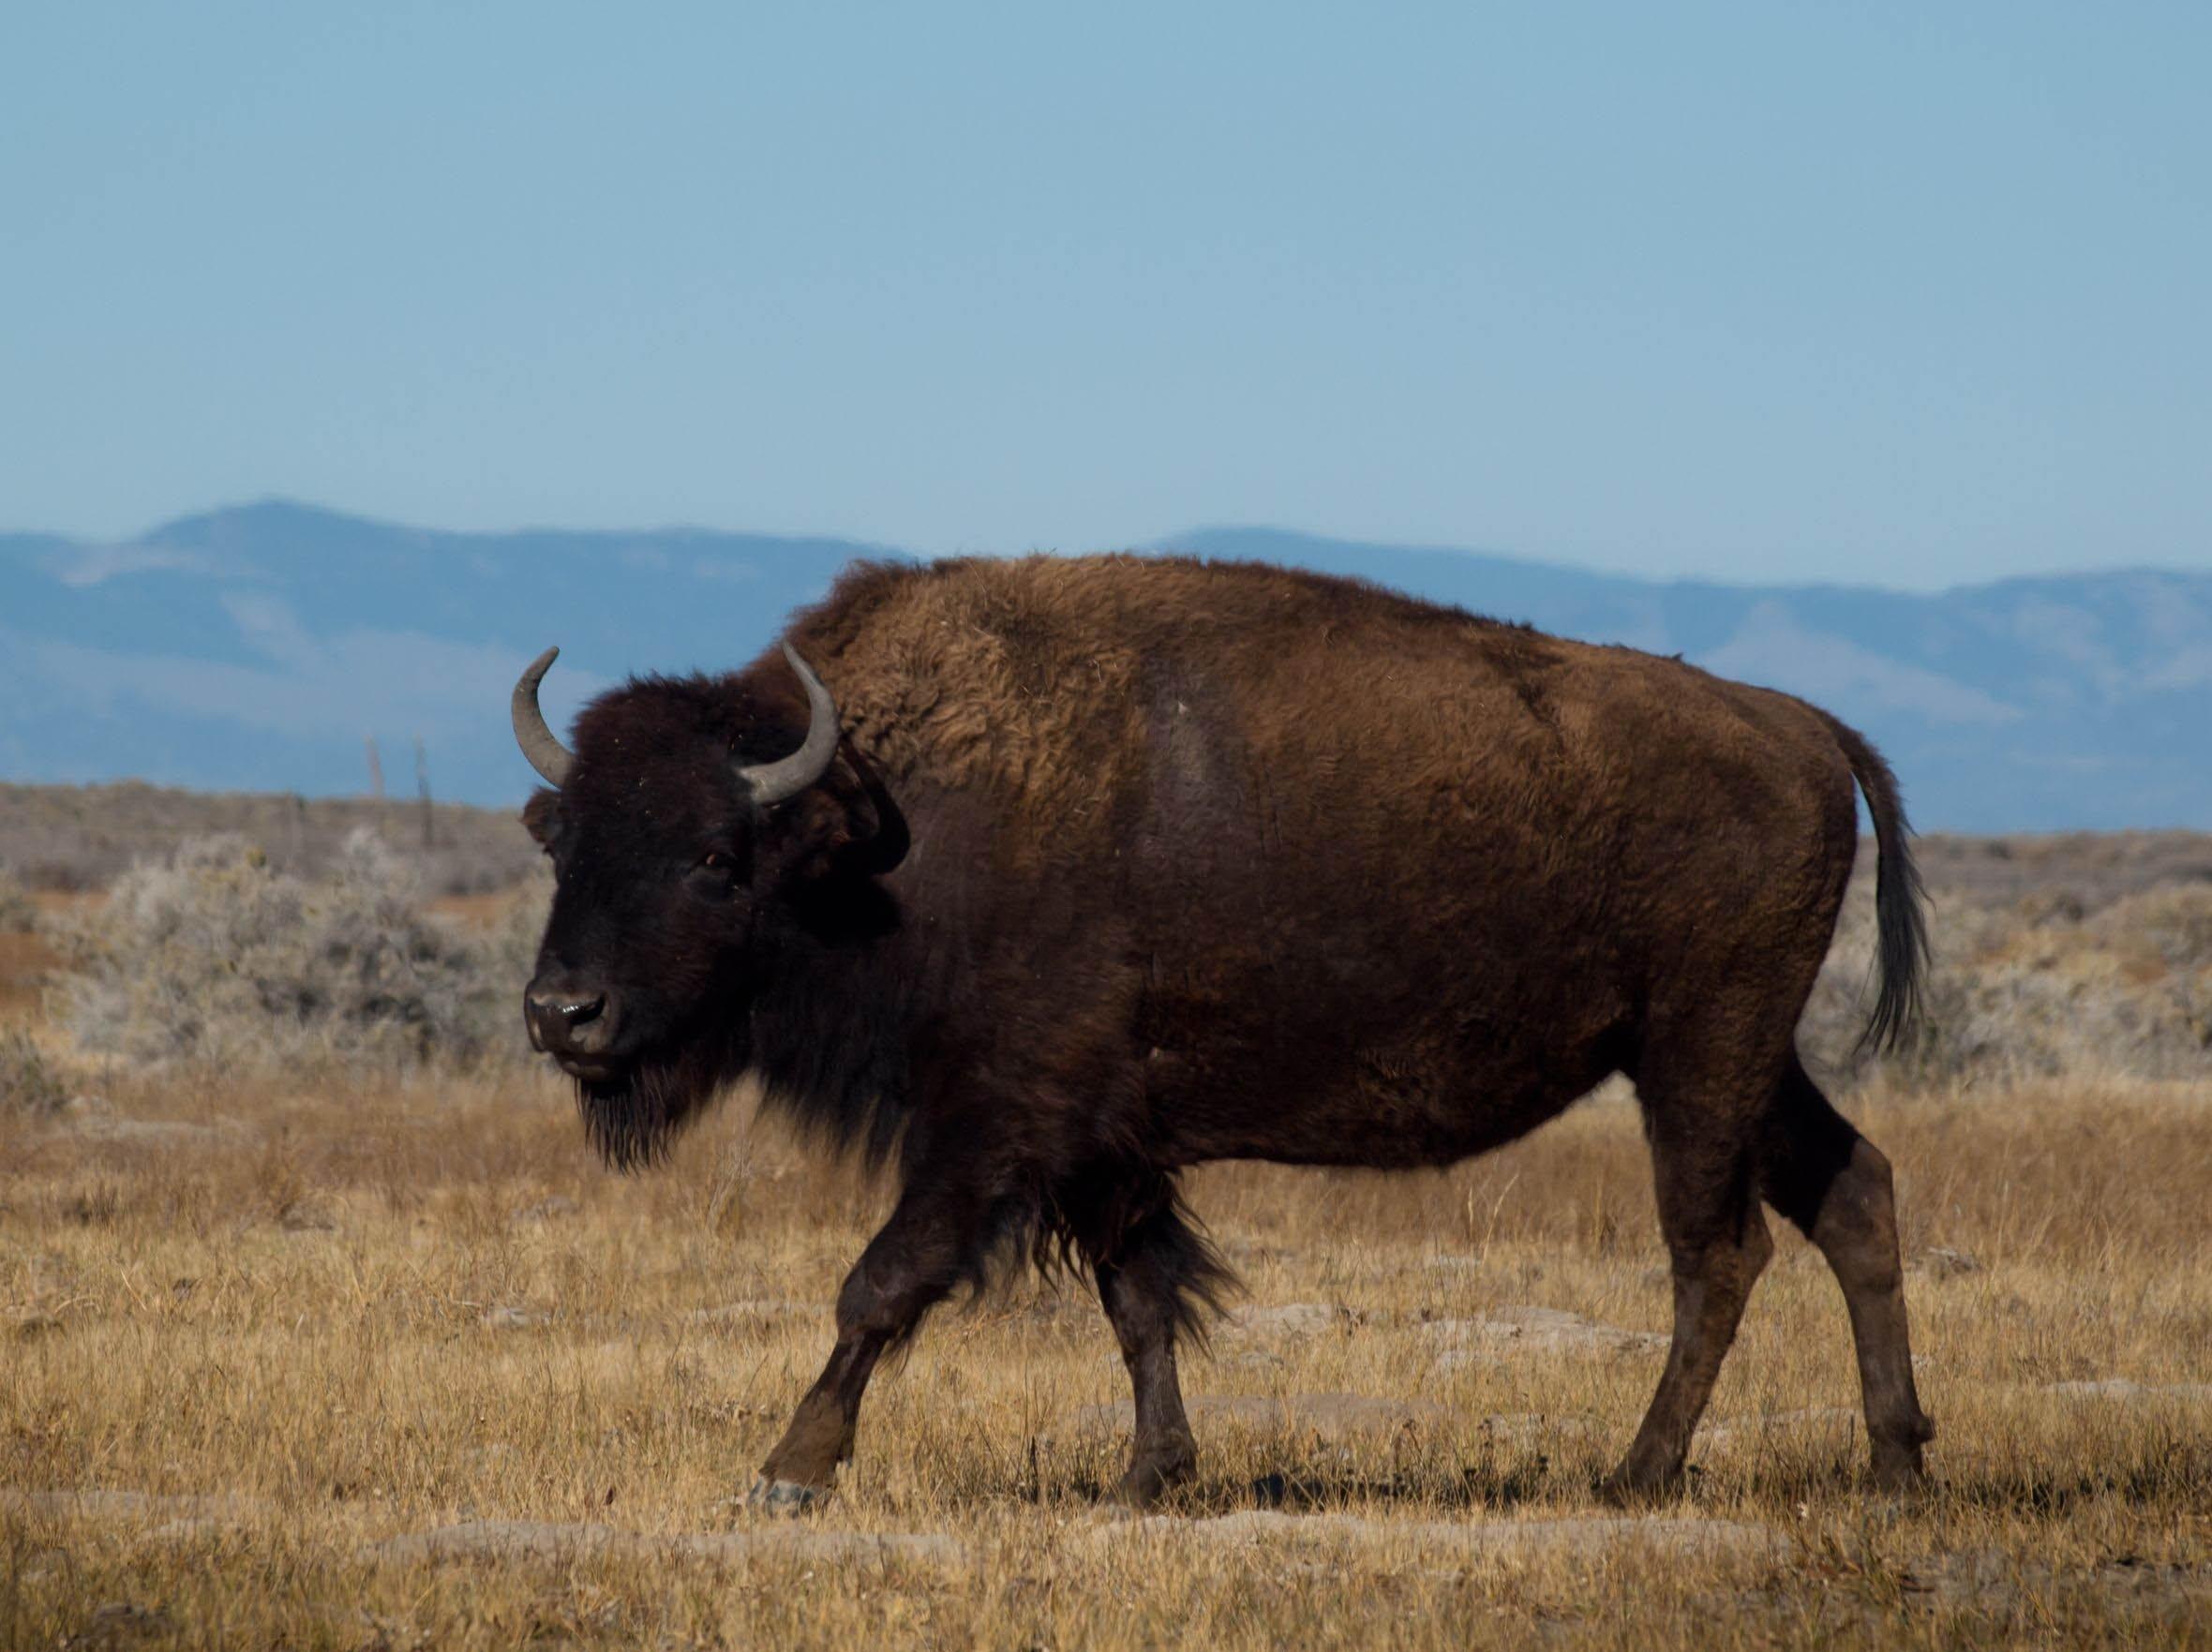 bison-plains-america